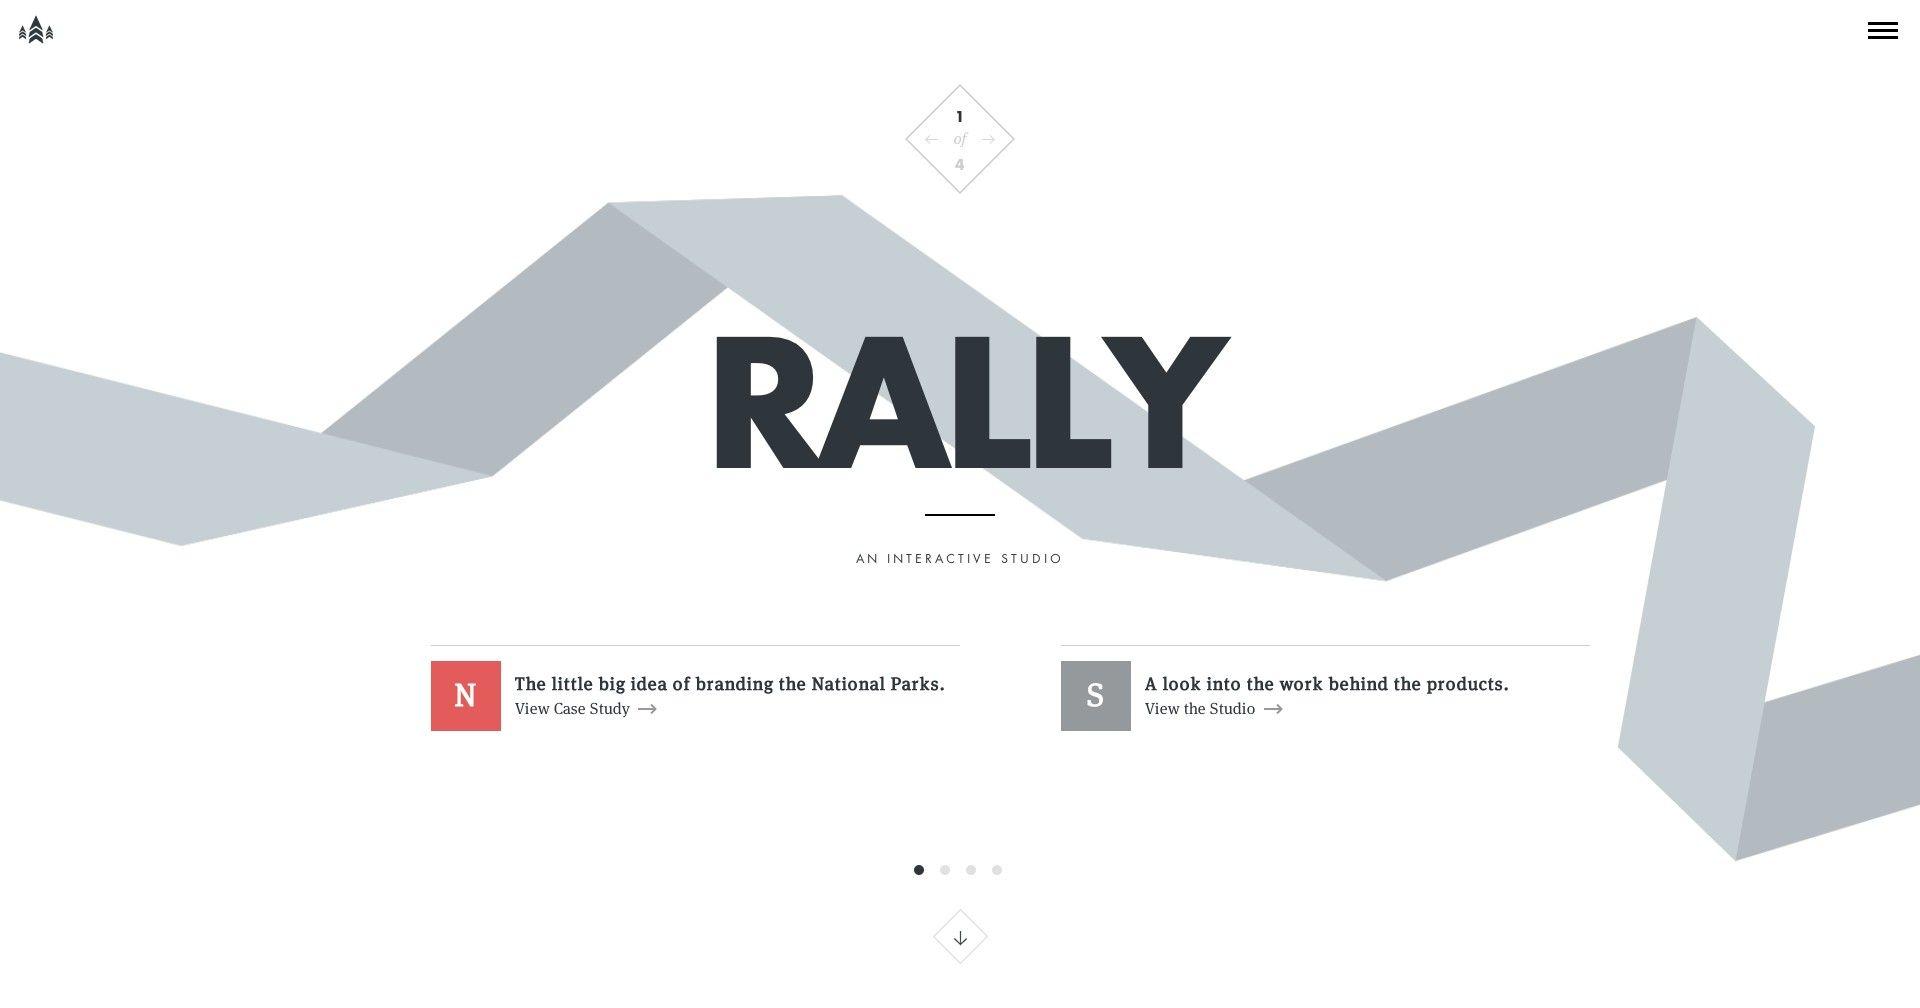 http://beta.rallyinteractive.com/